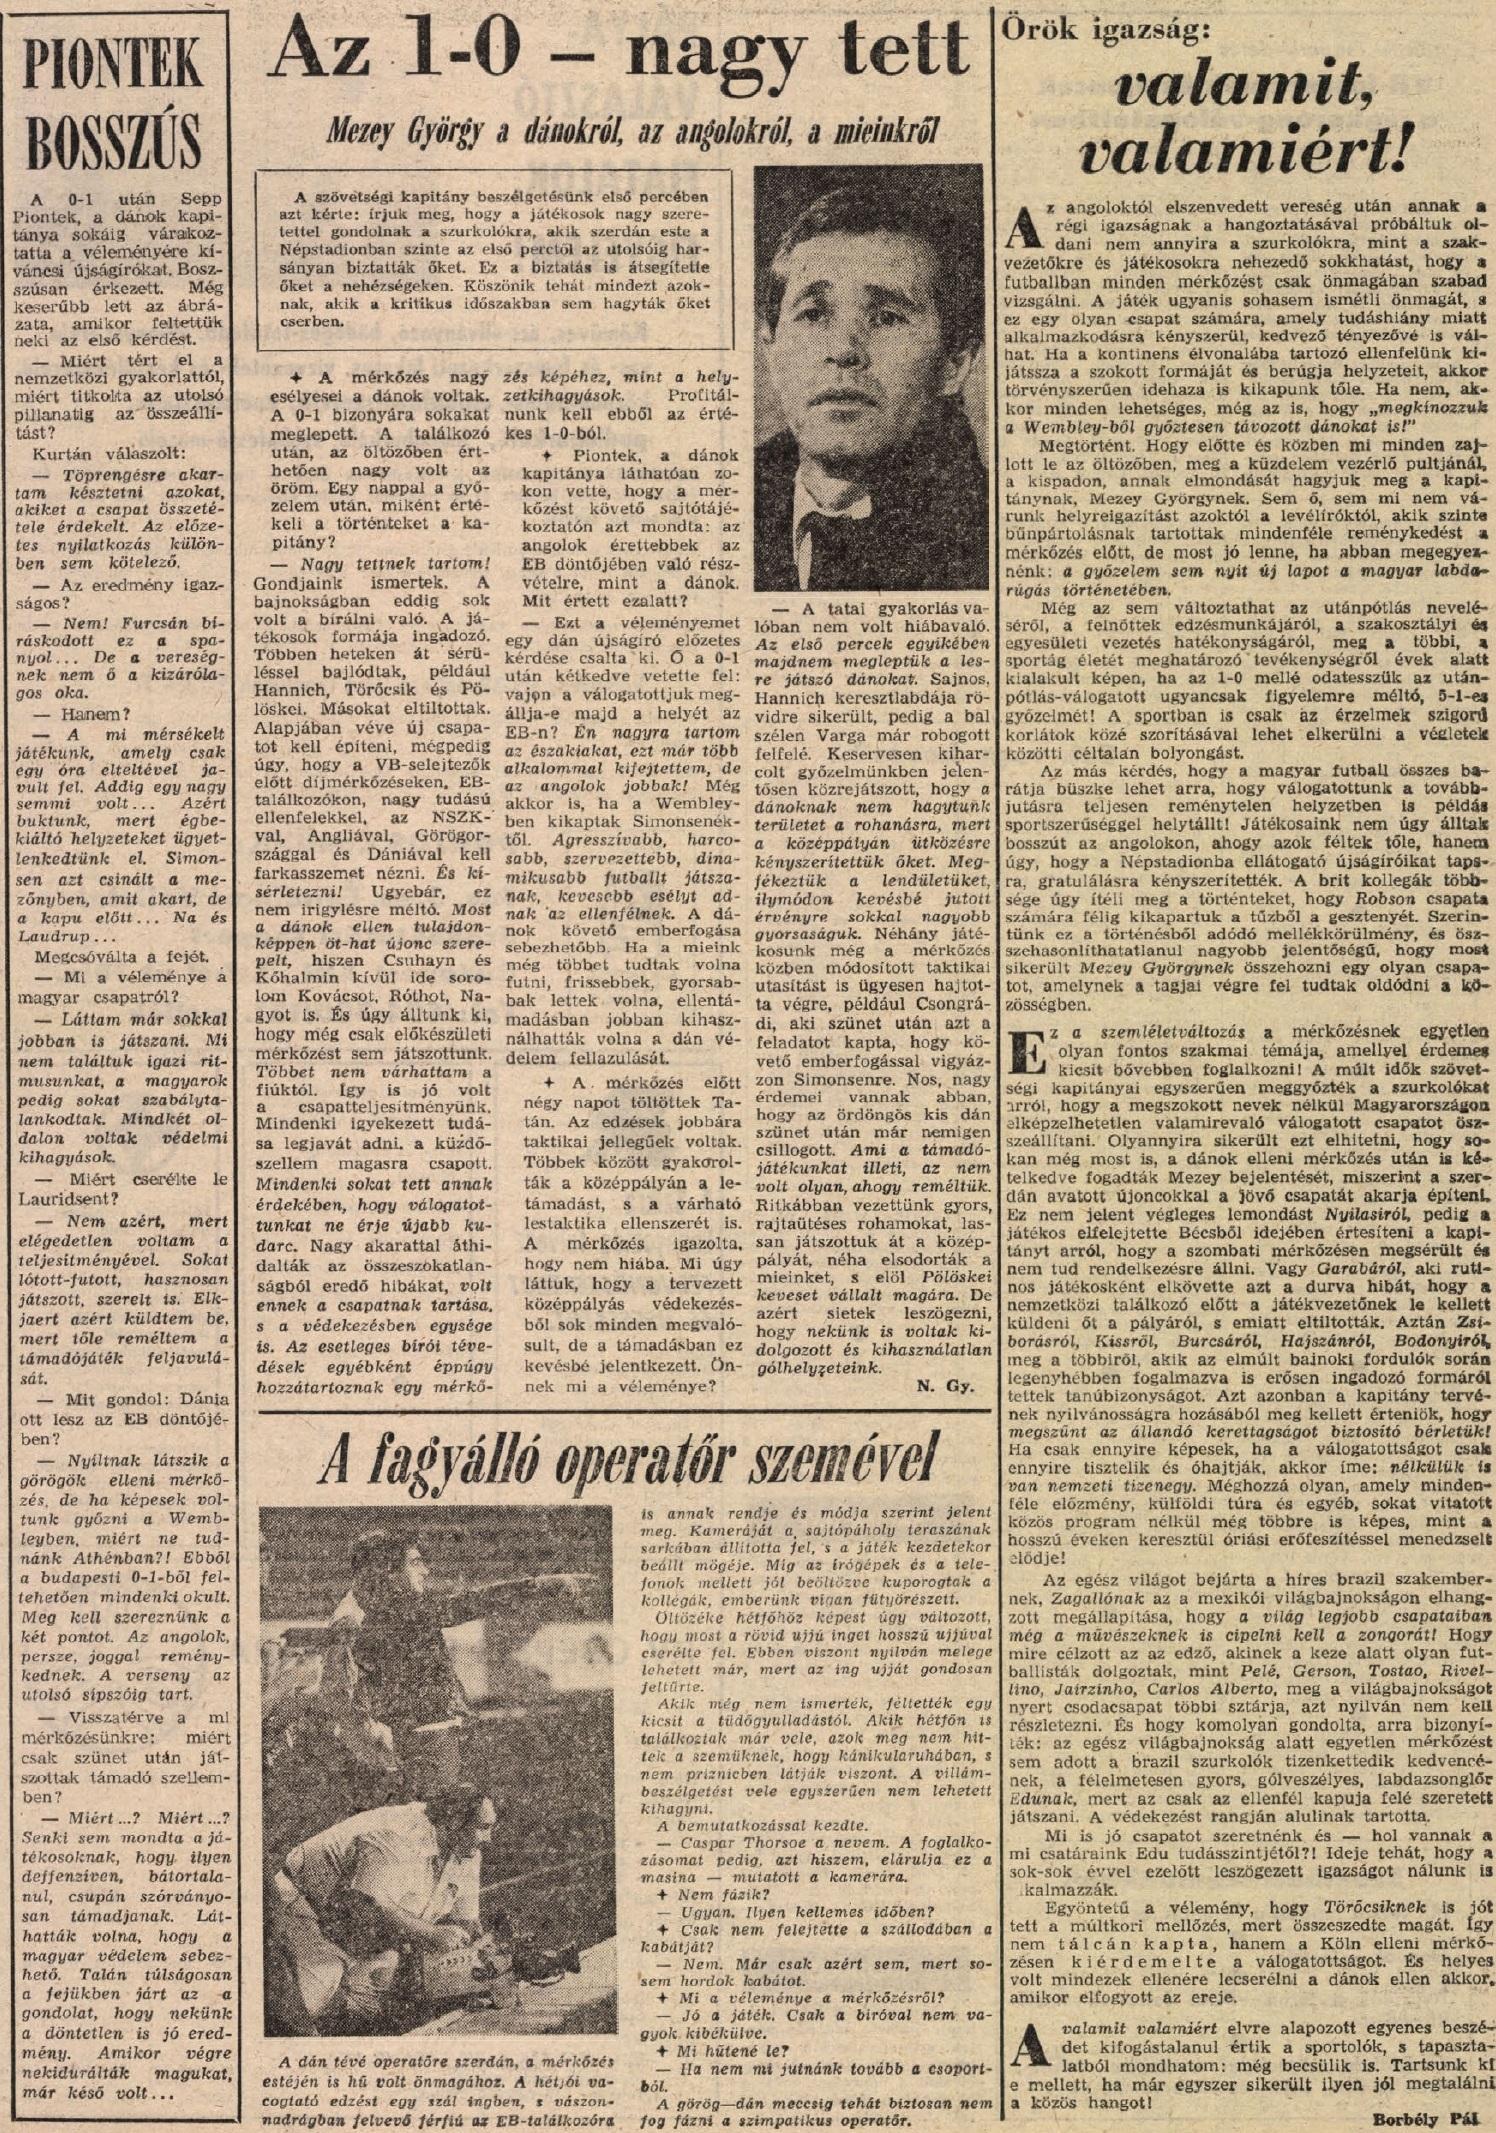 idokapszula_nb_i_1983_84_magyarorszag_dania_eb-selejtezo_merkozes_2.jpg